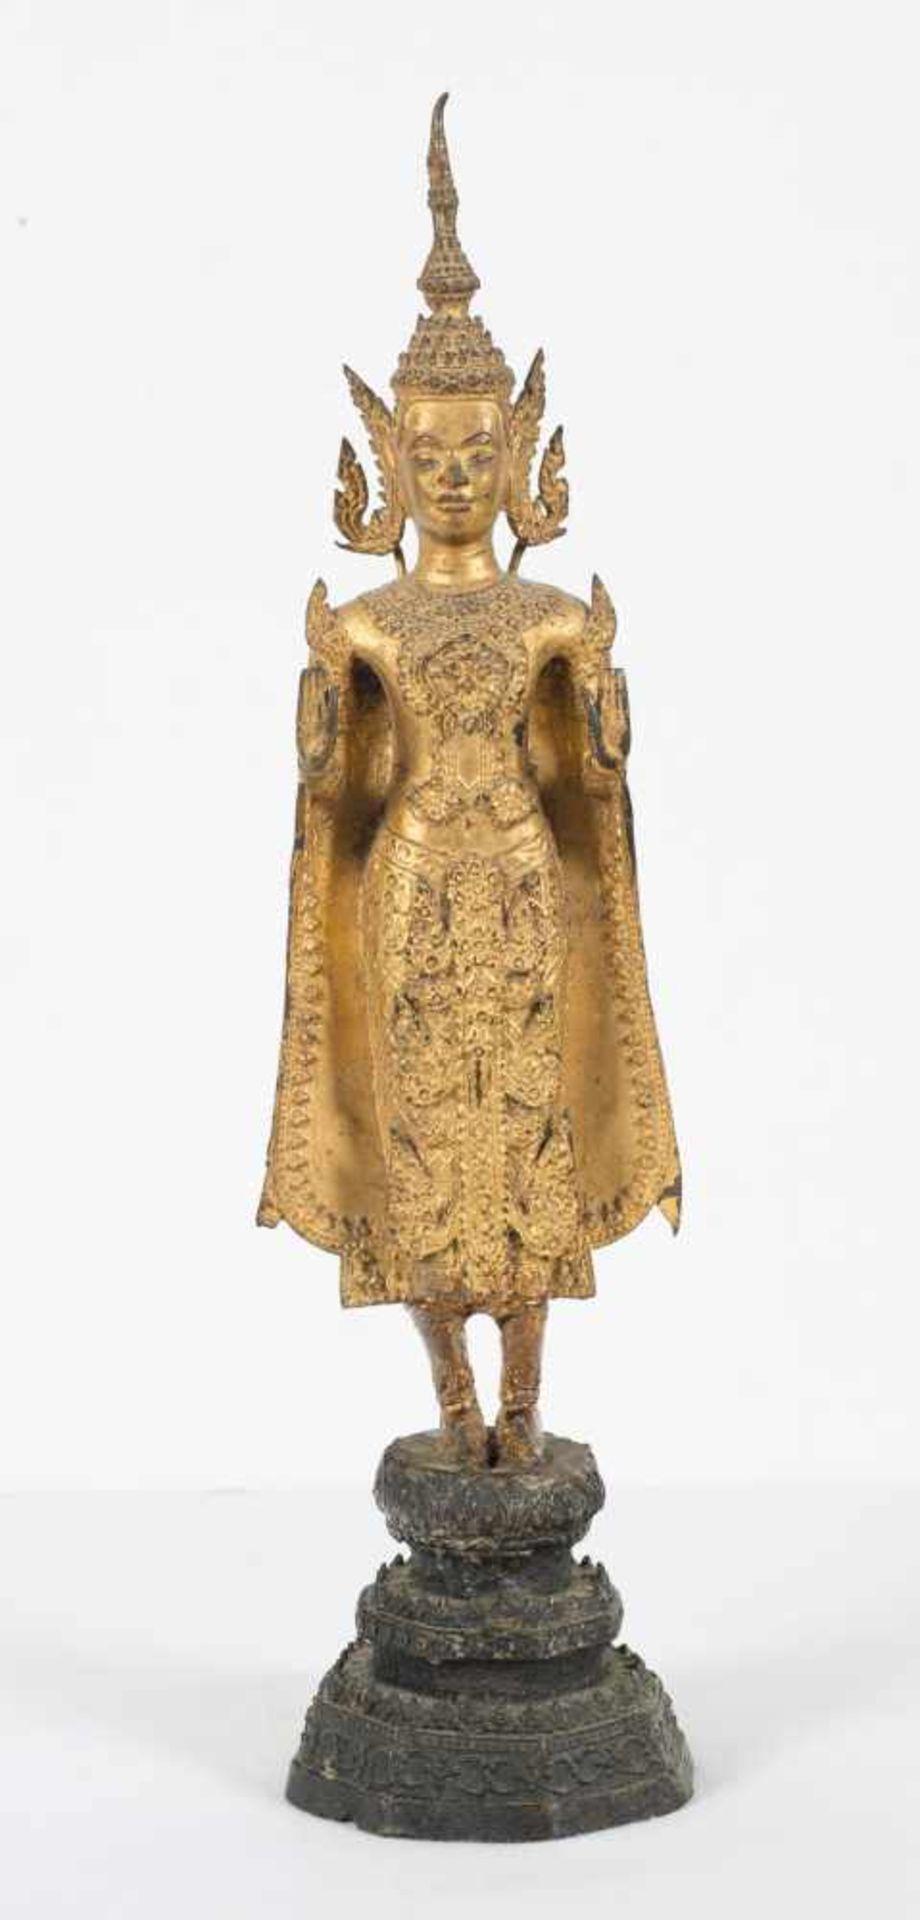 Los 44 - A gilt bronze figure of Buddha. Thailand. Rattanakosin period. 18th Century. Standing on a tier